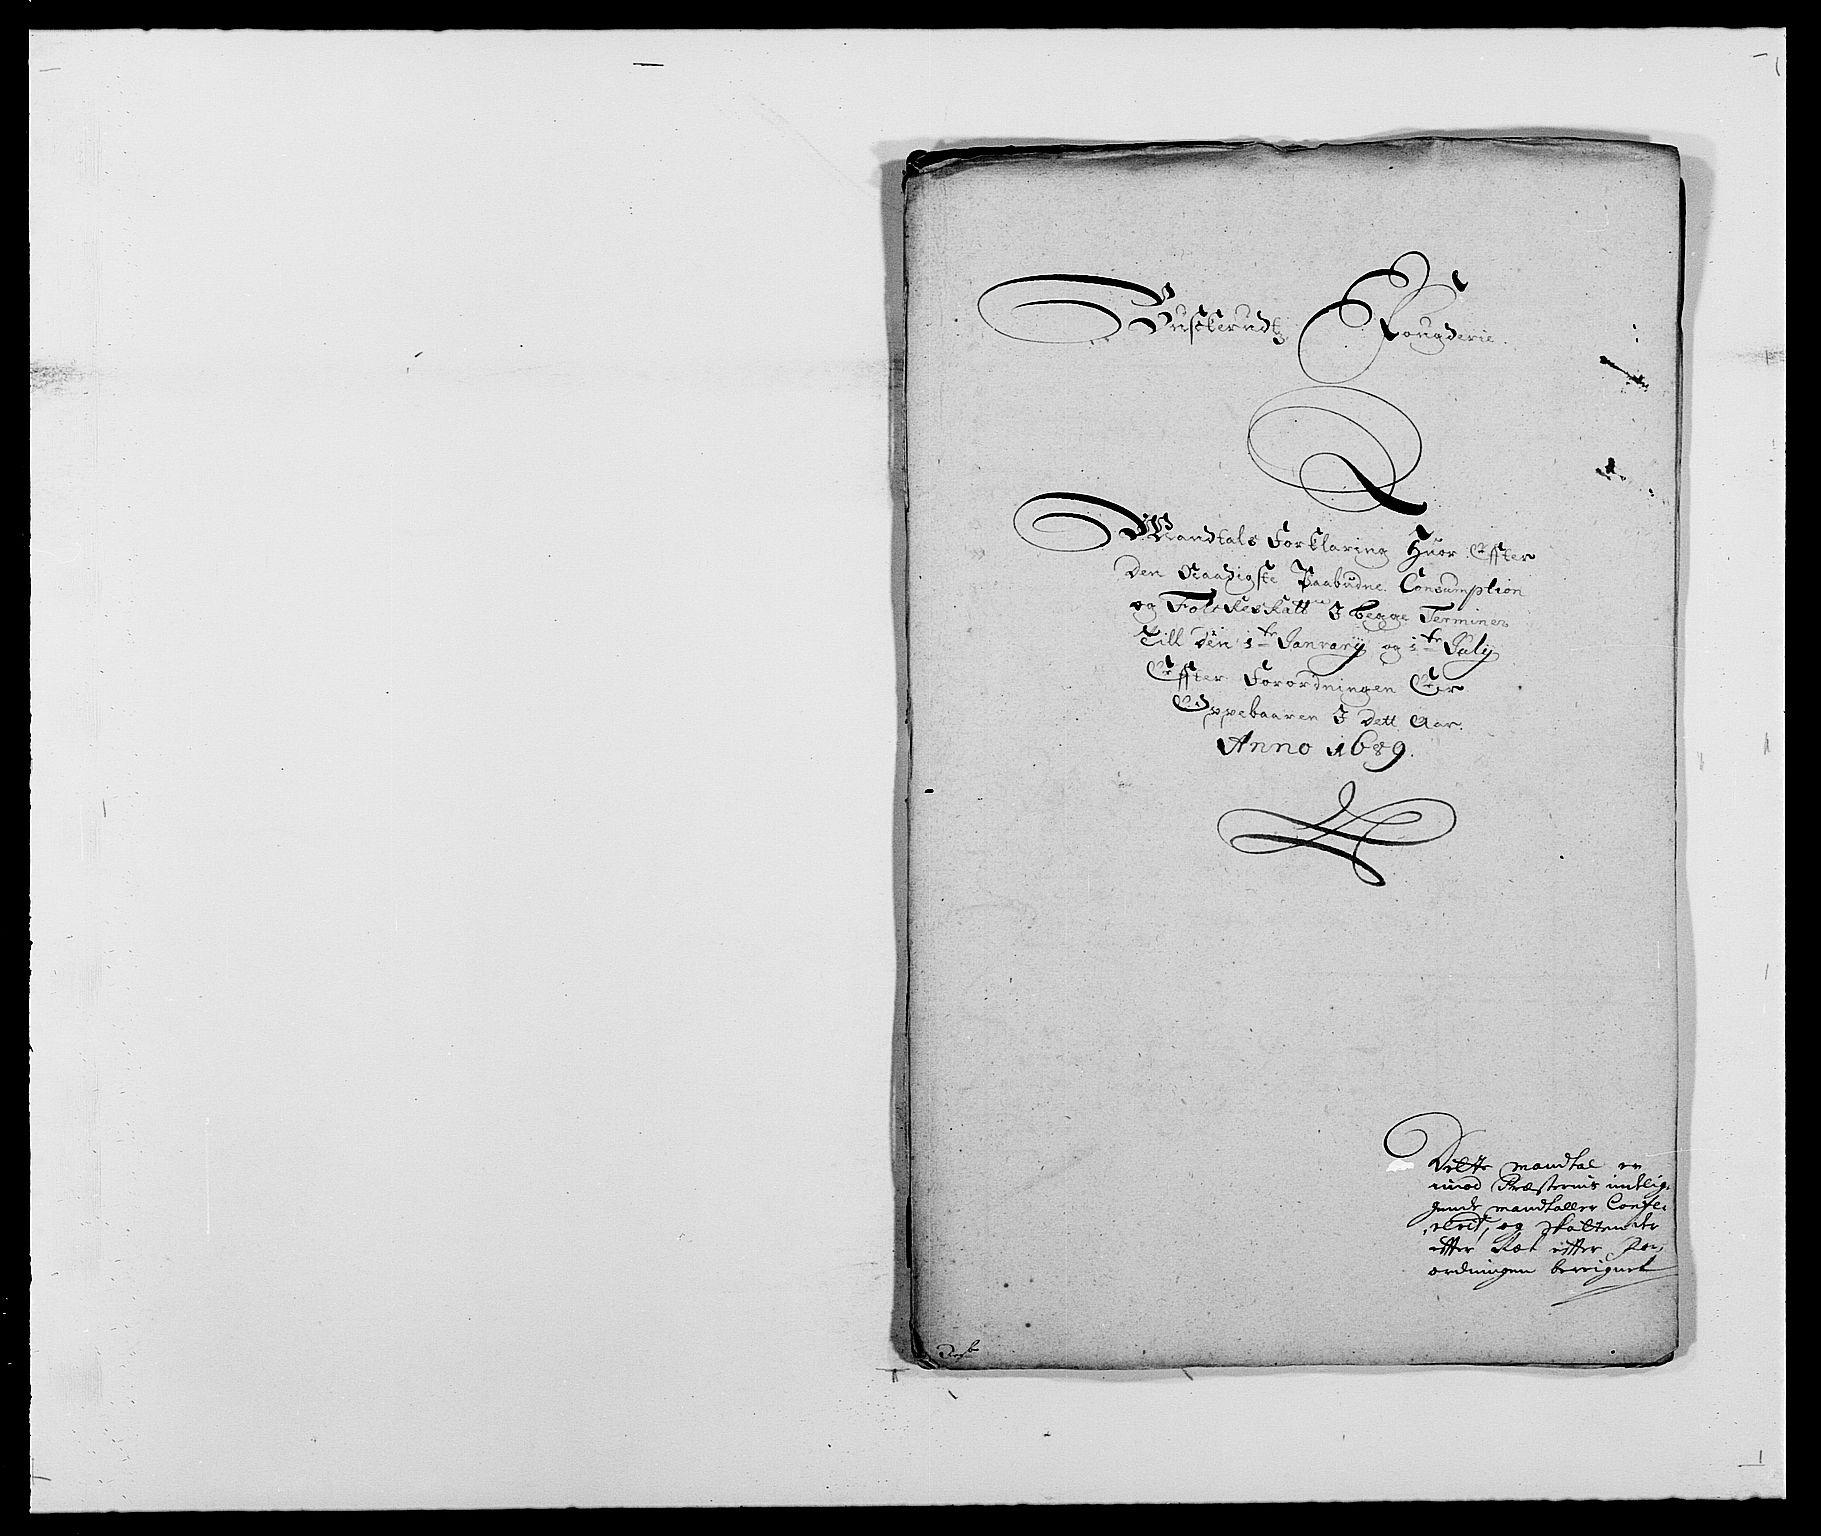 RA, Rentekammeret inntil 1814, Reviderte regnskaper, Fogderegnskap, R25/L1680: Fogderegnskap Buskerud, 1689-1690, s. 207